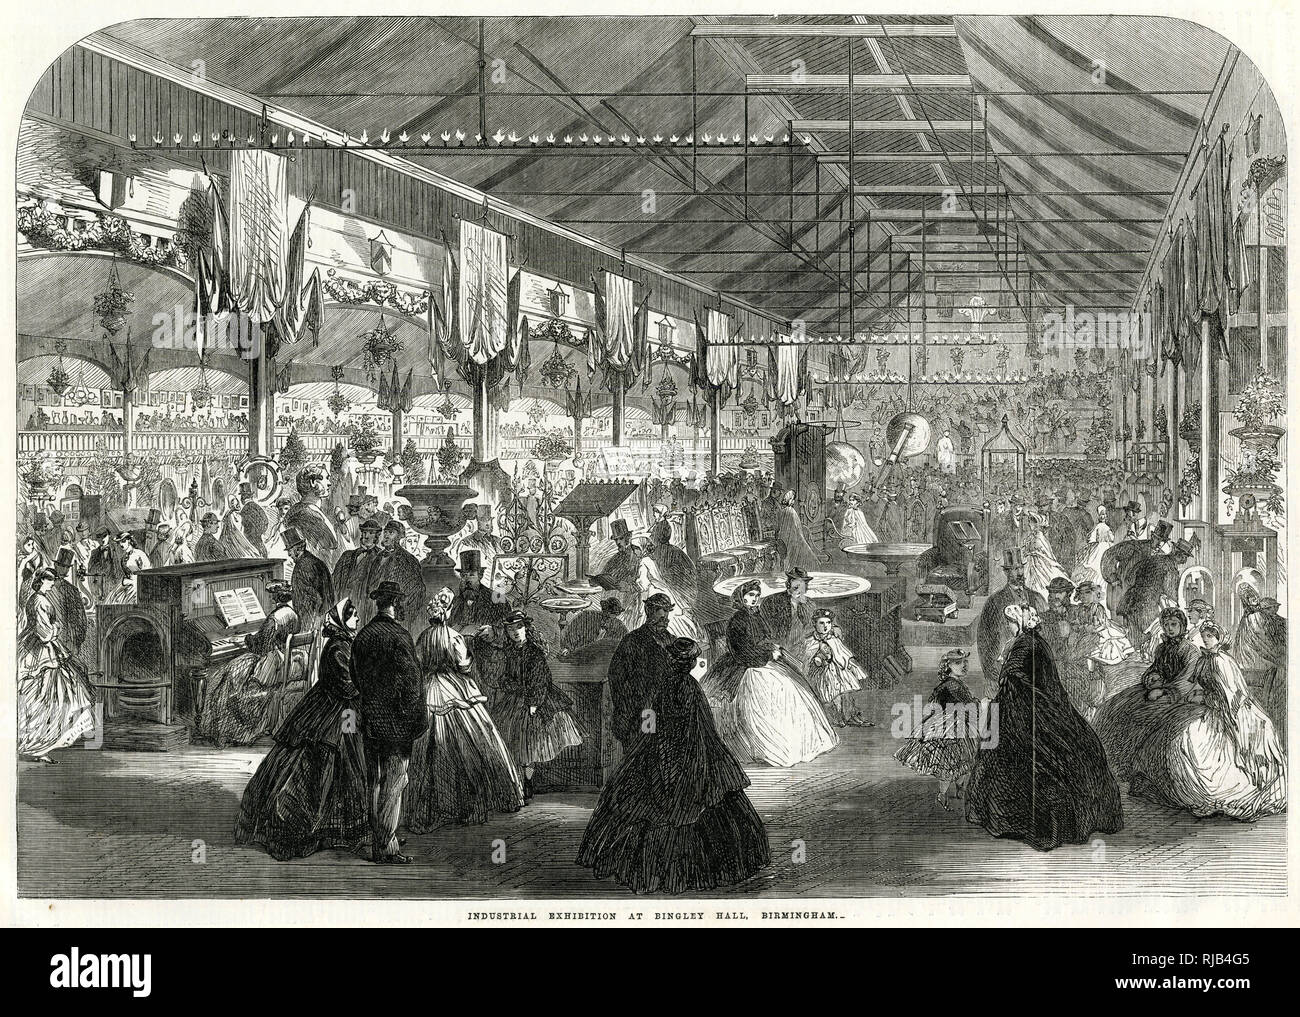 Interior of Industrial Exhibition at Bingley Hall, Birmingham. Stock Photo